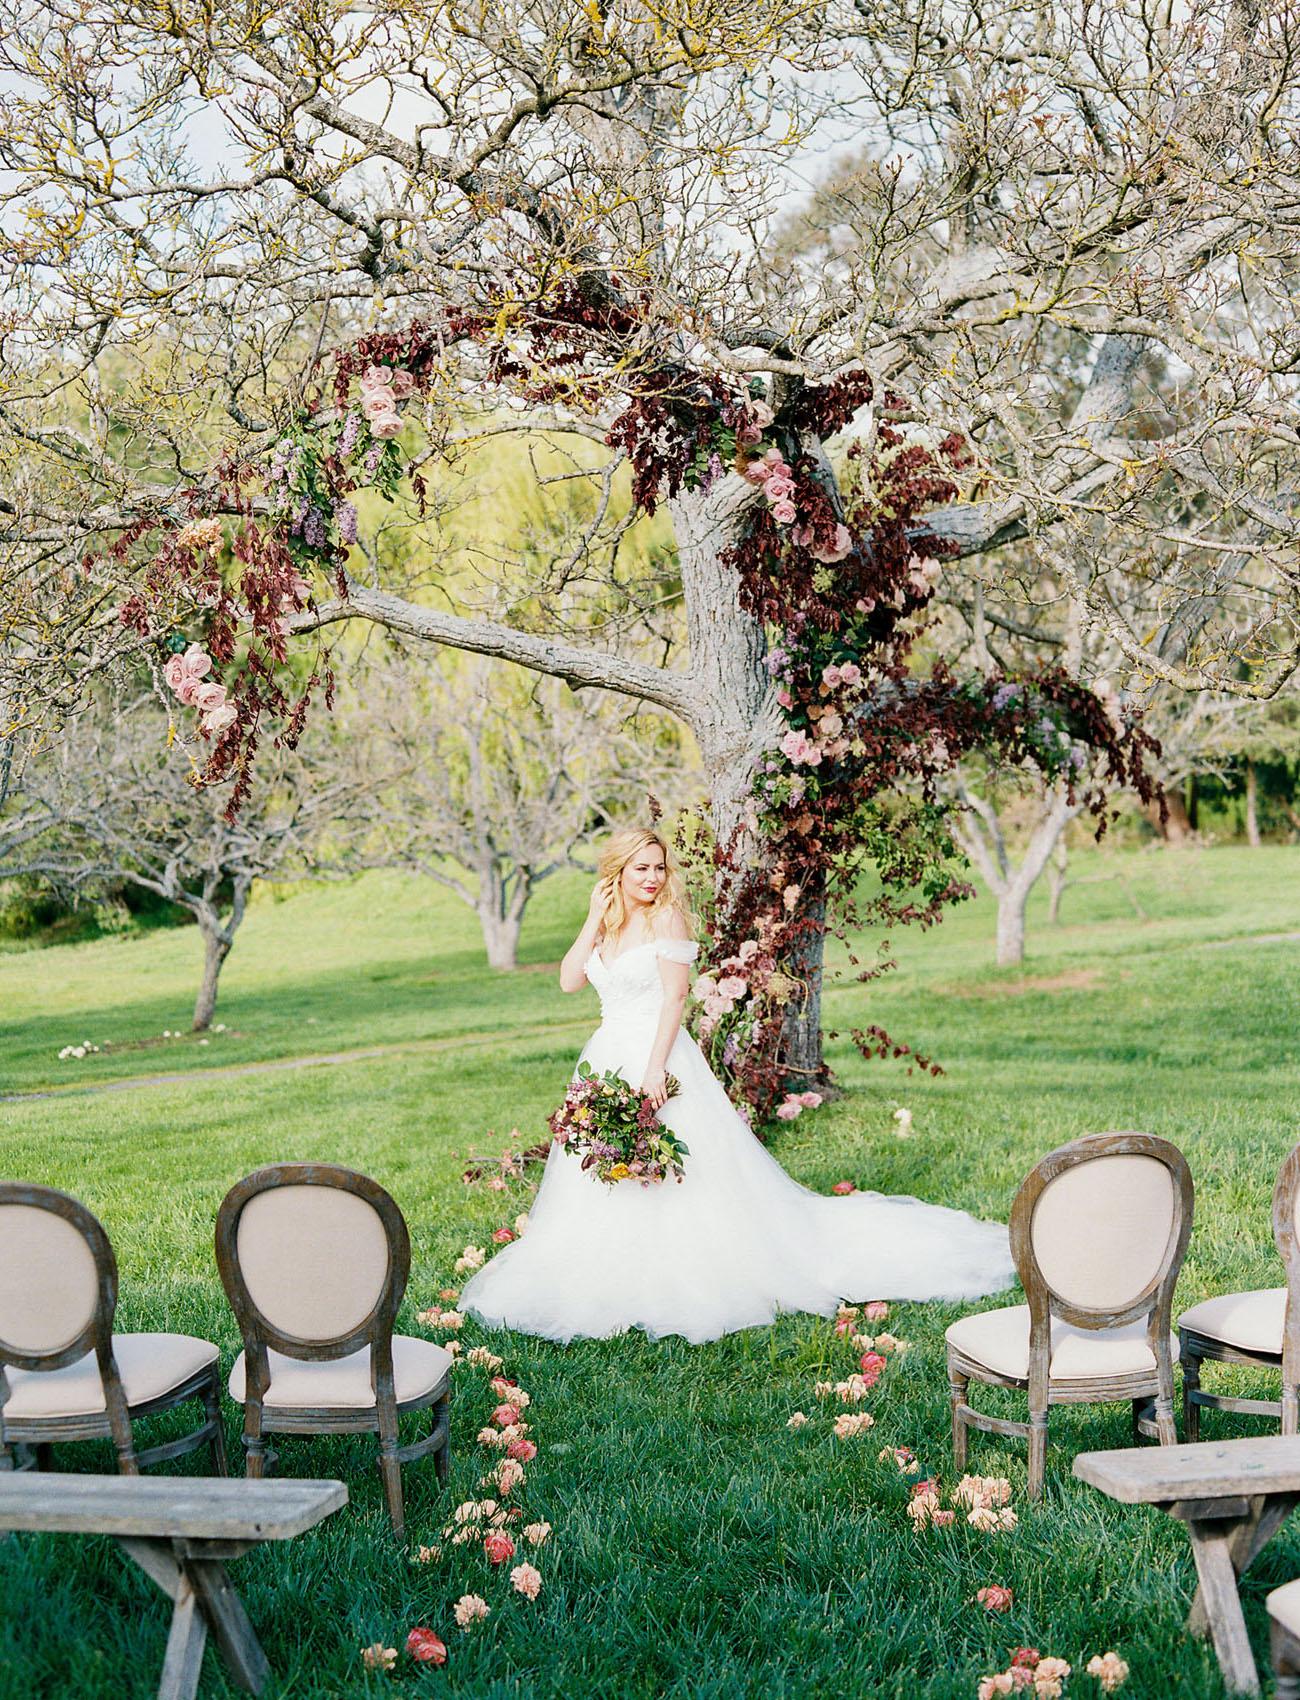 Edgy Romantic Wedding Inspiration